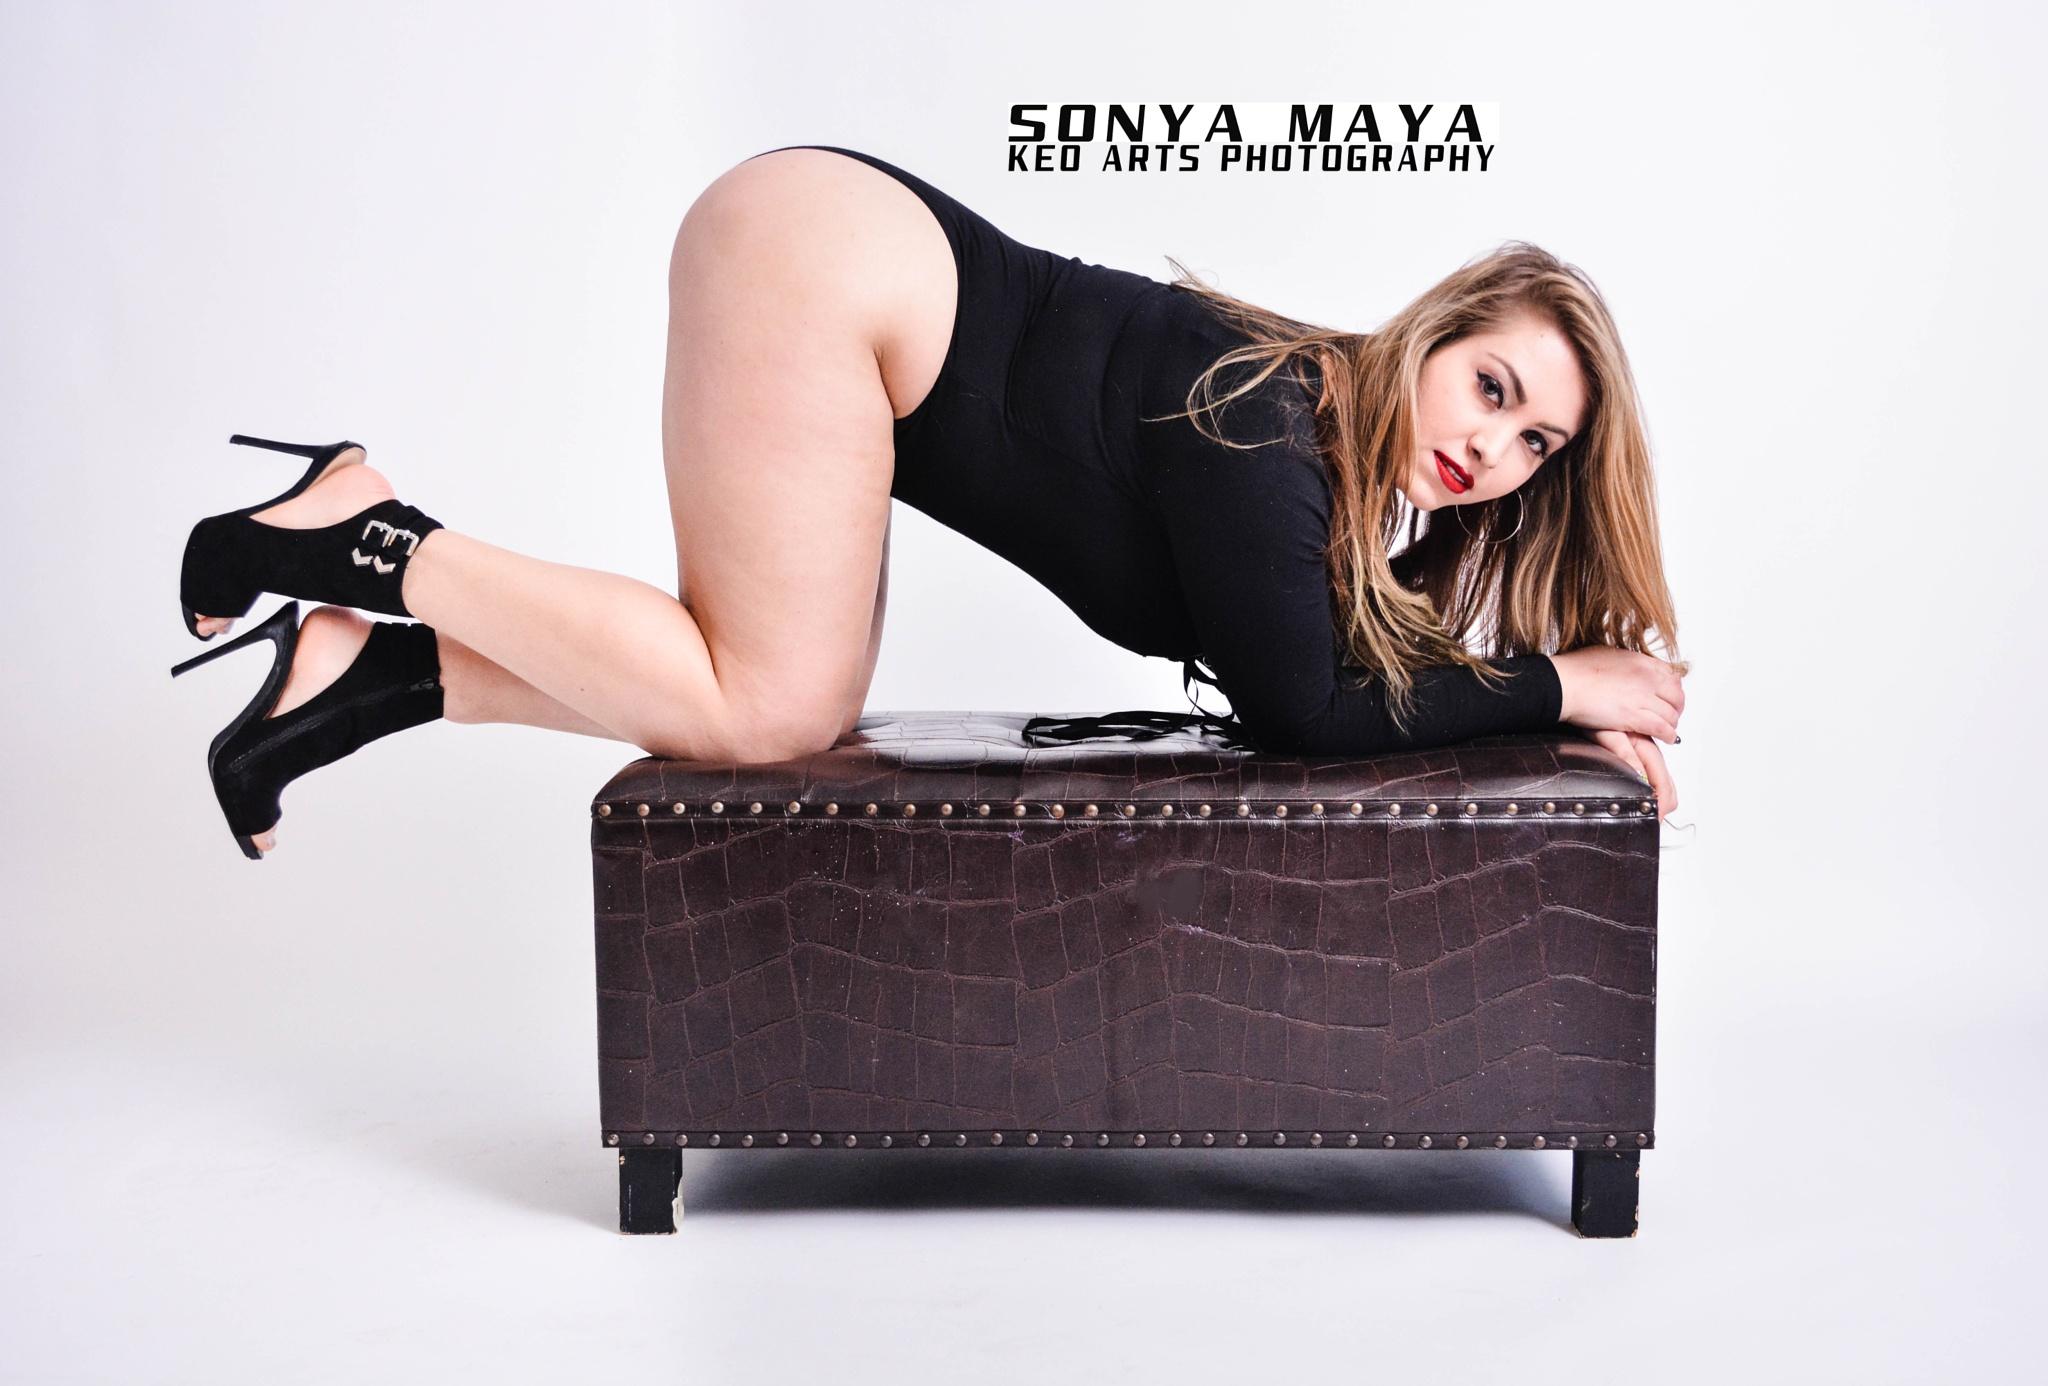 Sonya sexy indoor shoot  by Keo Arts Photography